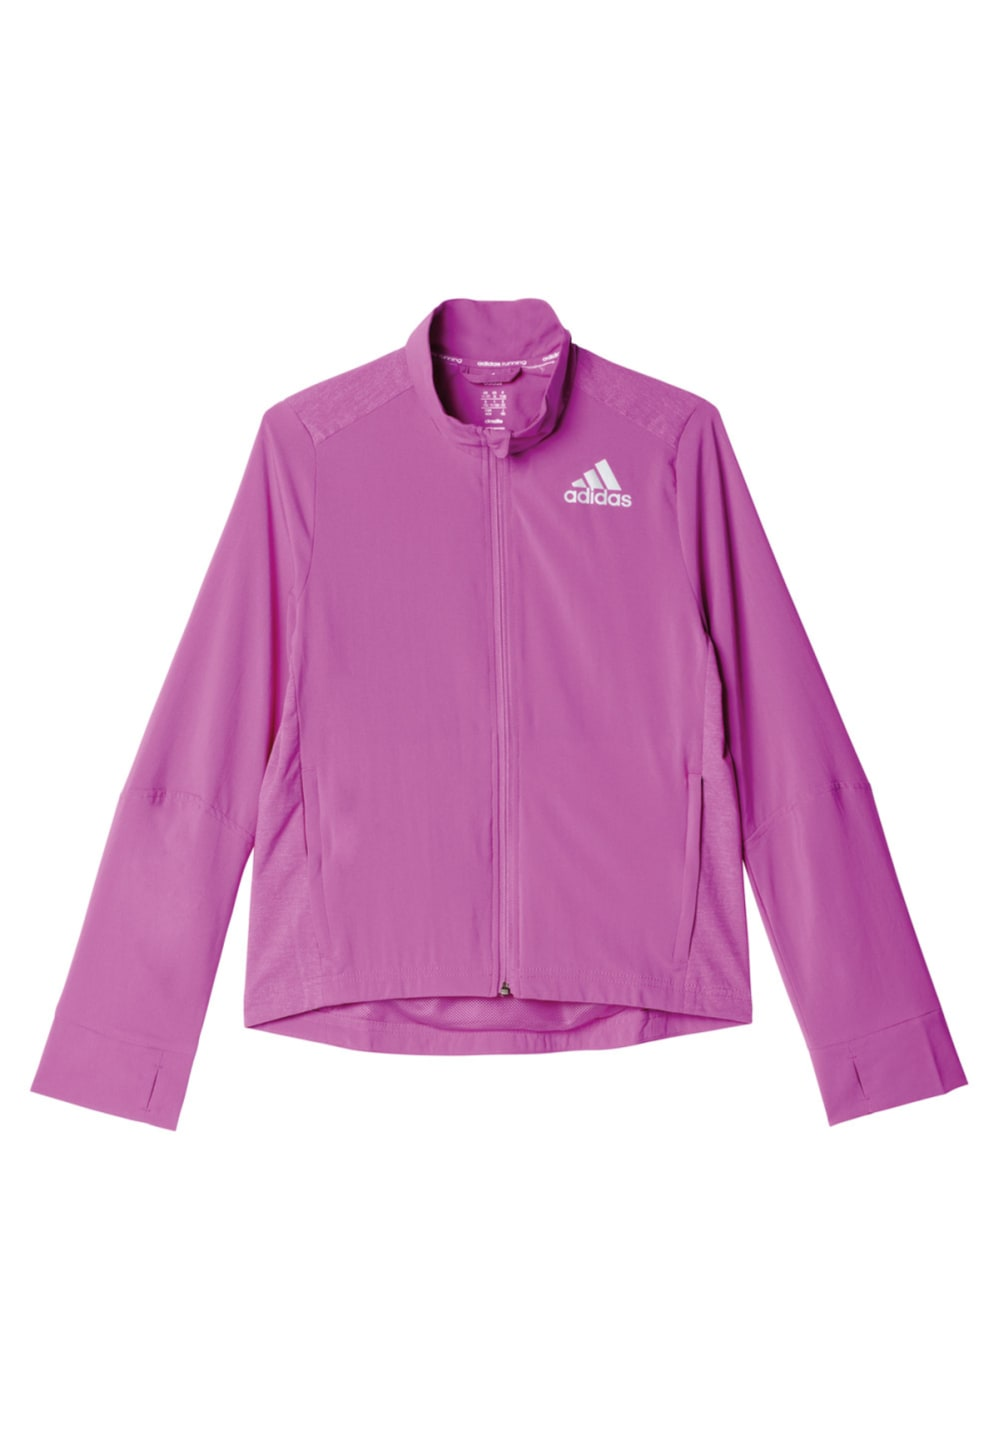 adidas Running Girls Wind Breaker - Laufjacken für Mädchen - Lila